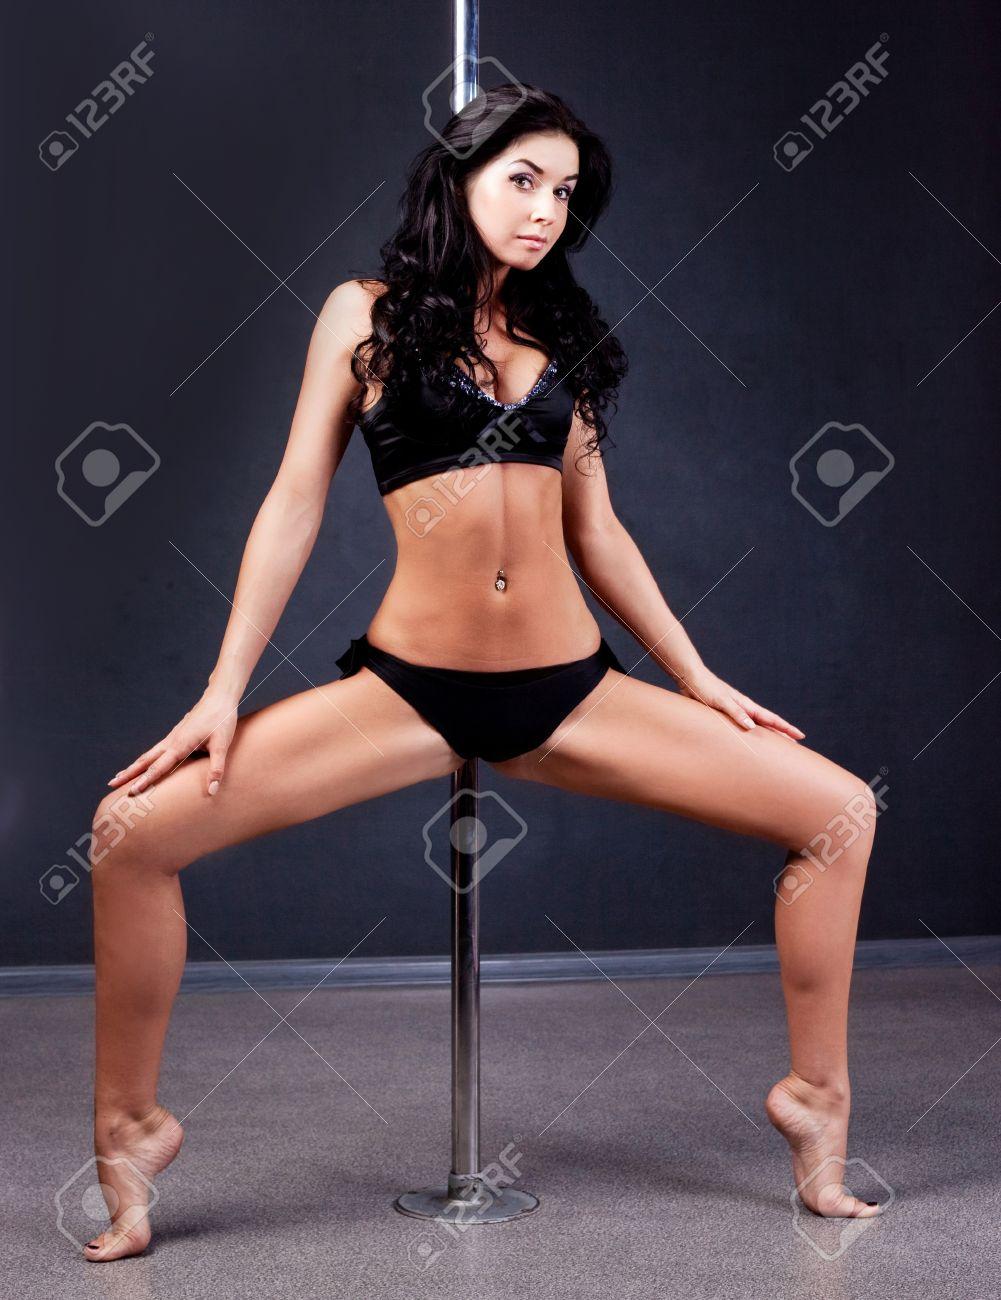 Muscular tijuana strippers